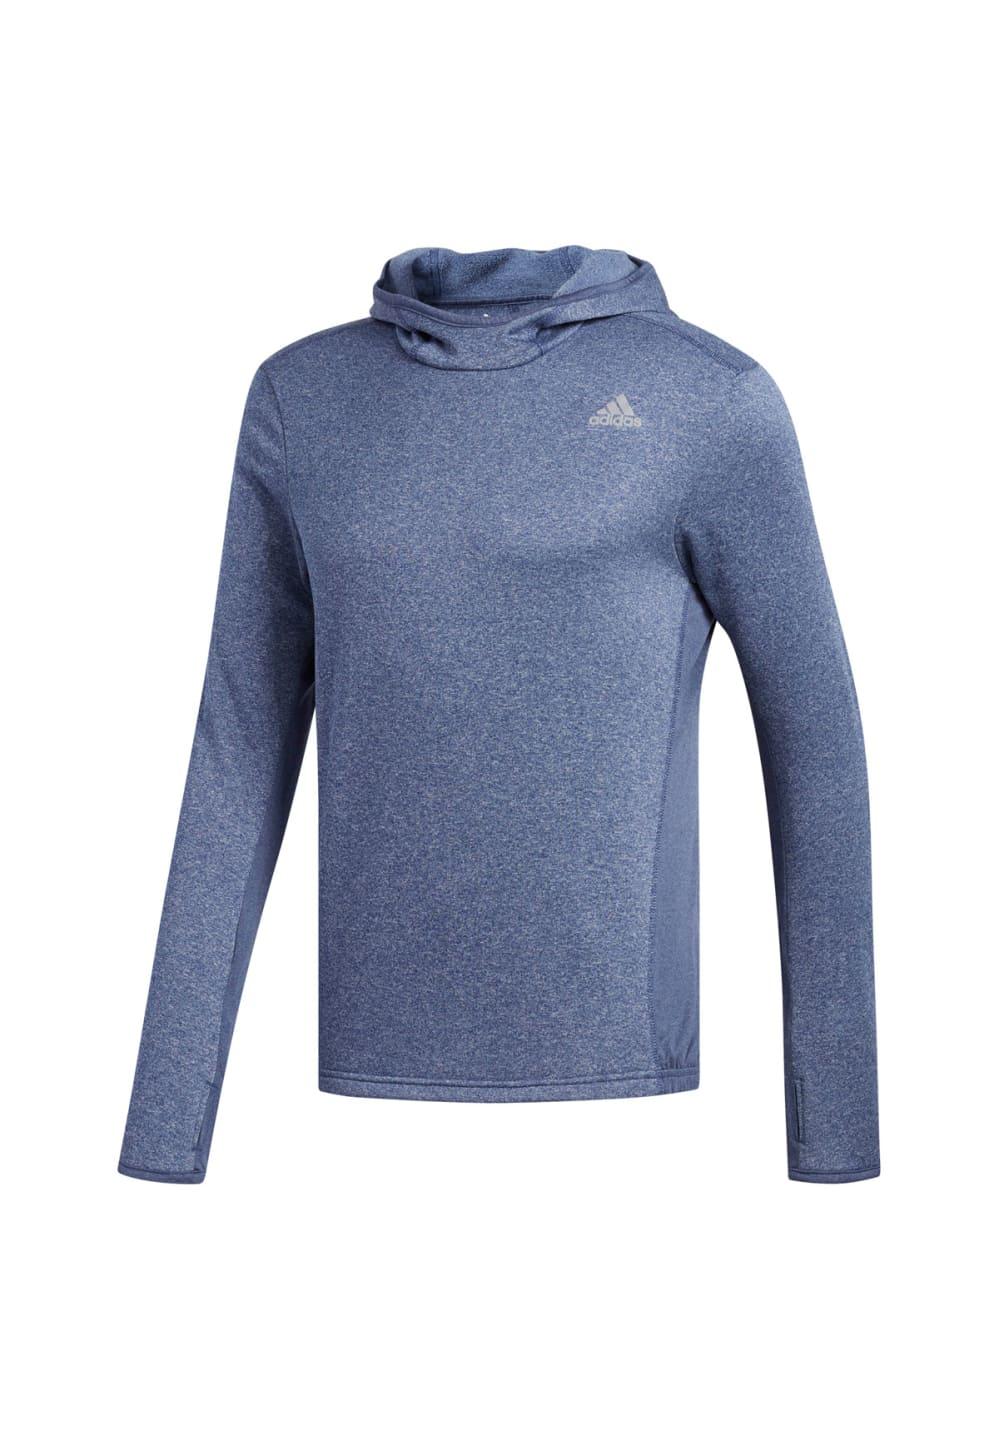 Hoodie For Astro Sweatshirts Hoodies Response Blue Adidas Men dtCrshBQx